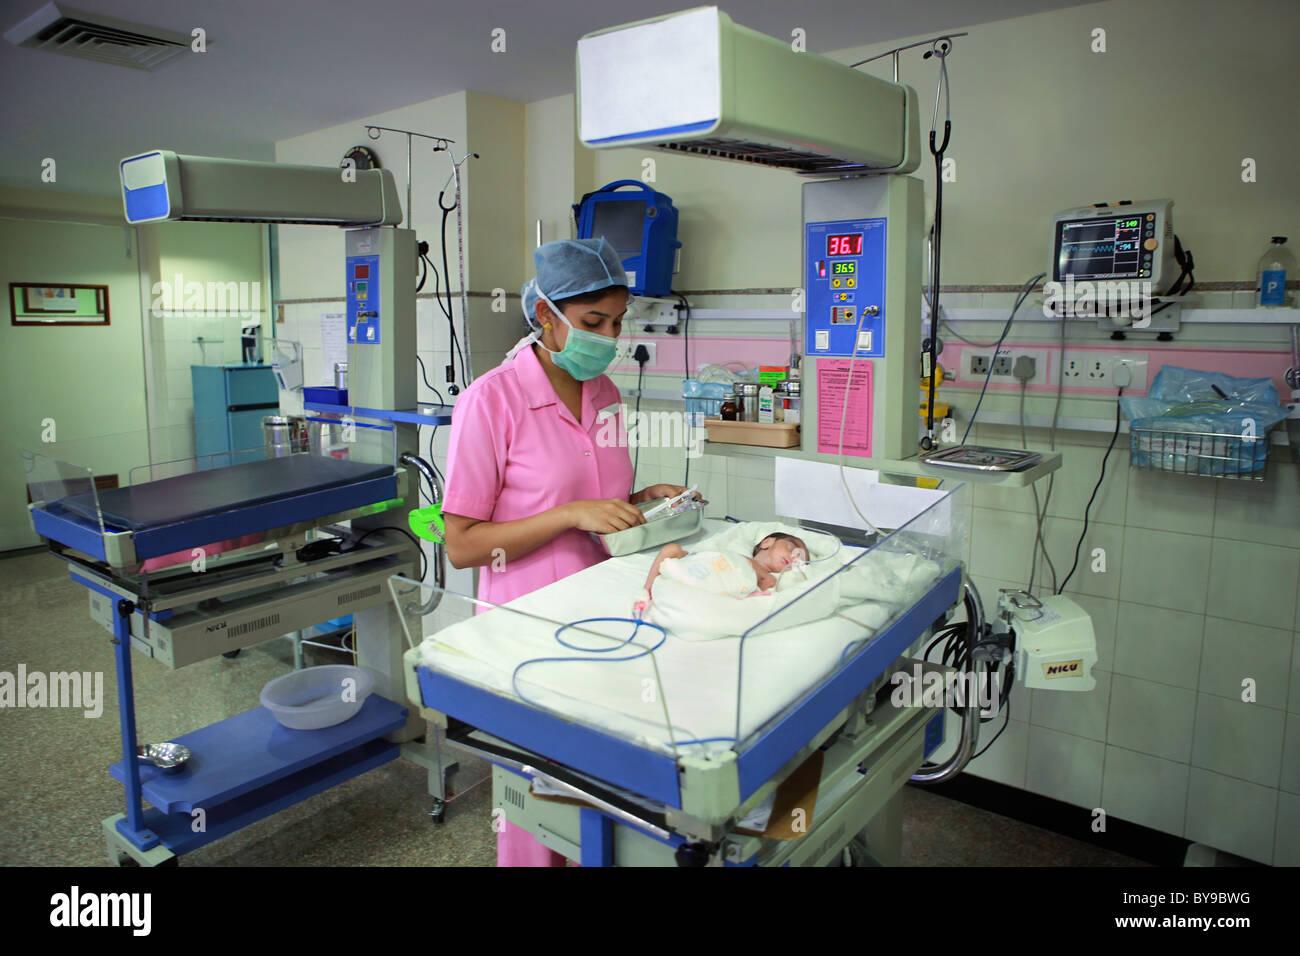 Nurse tending to newborn baby in hospital nursery Photo – Newborn Nursery Nurse